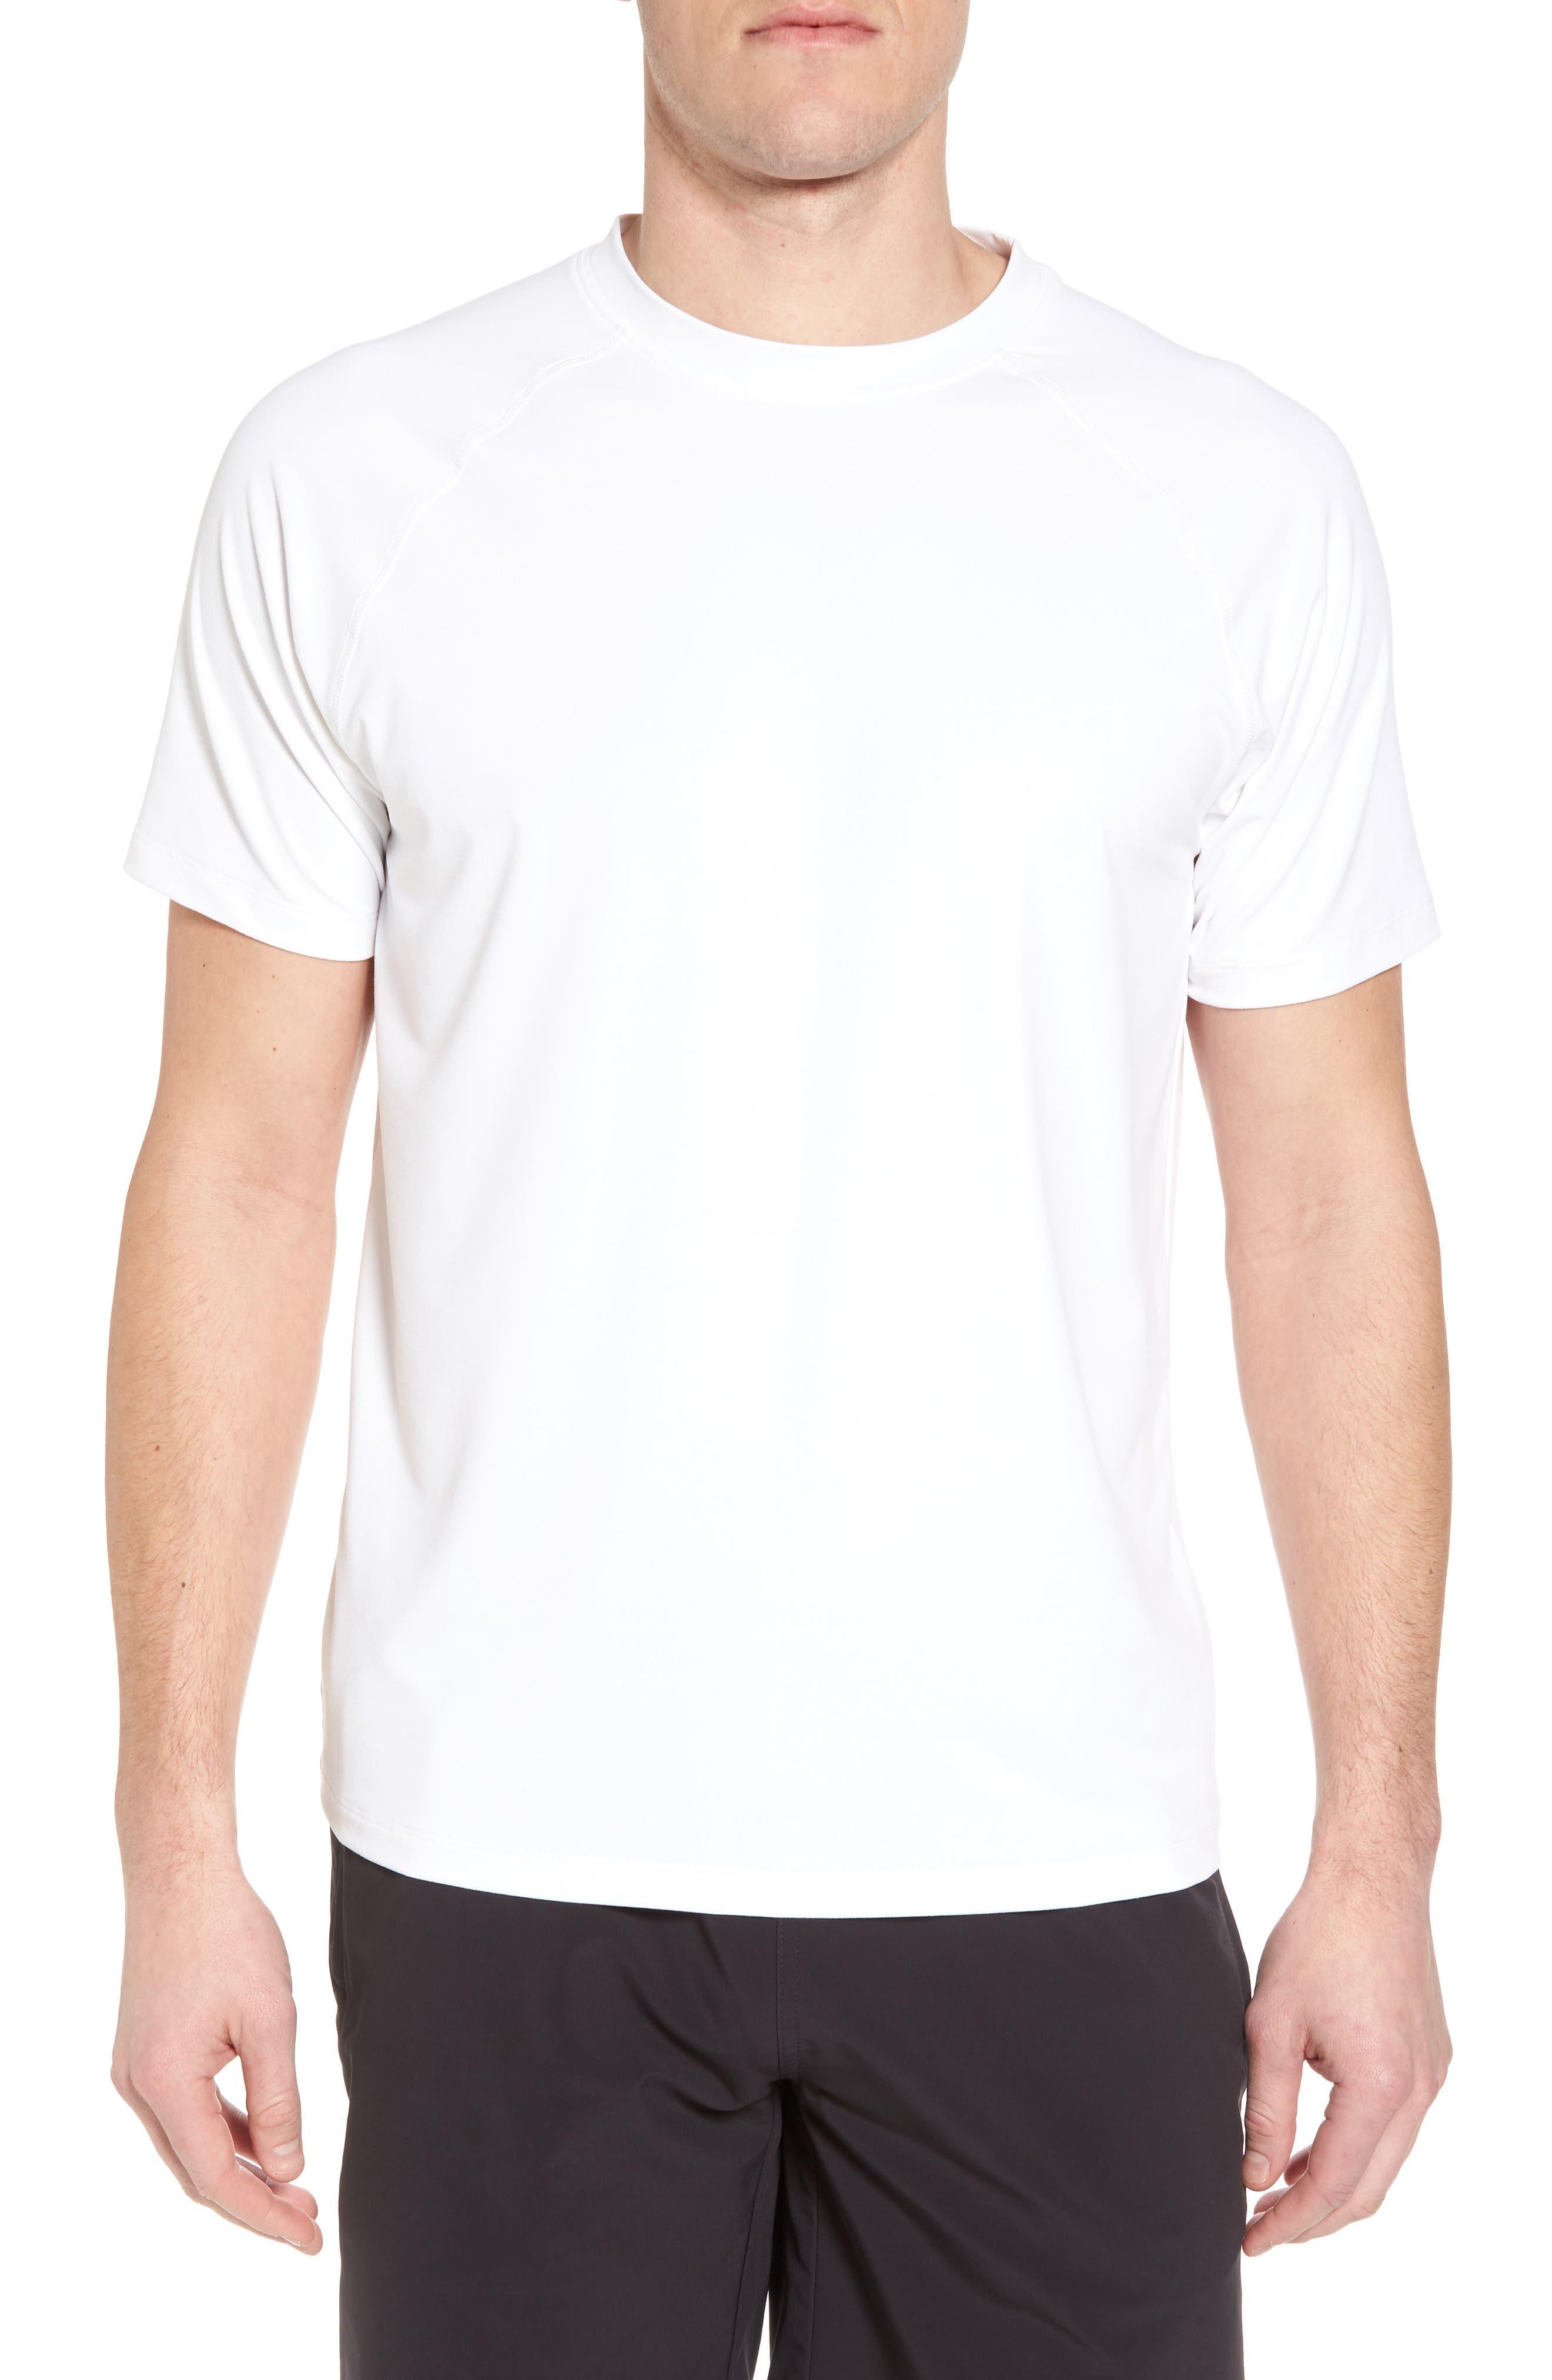 Rio Regular Fit Technical T-Shirt,                             Main thumbnail 1, color,                             100